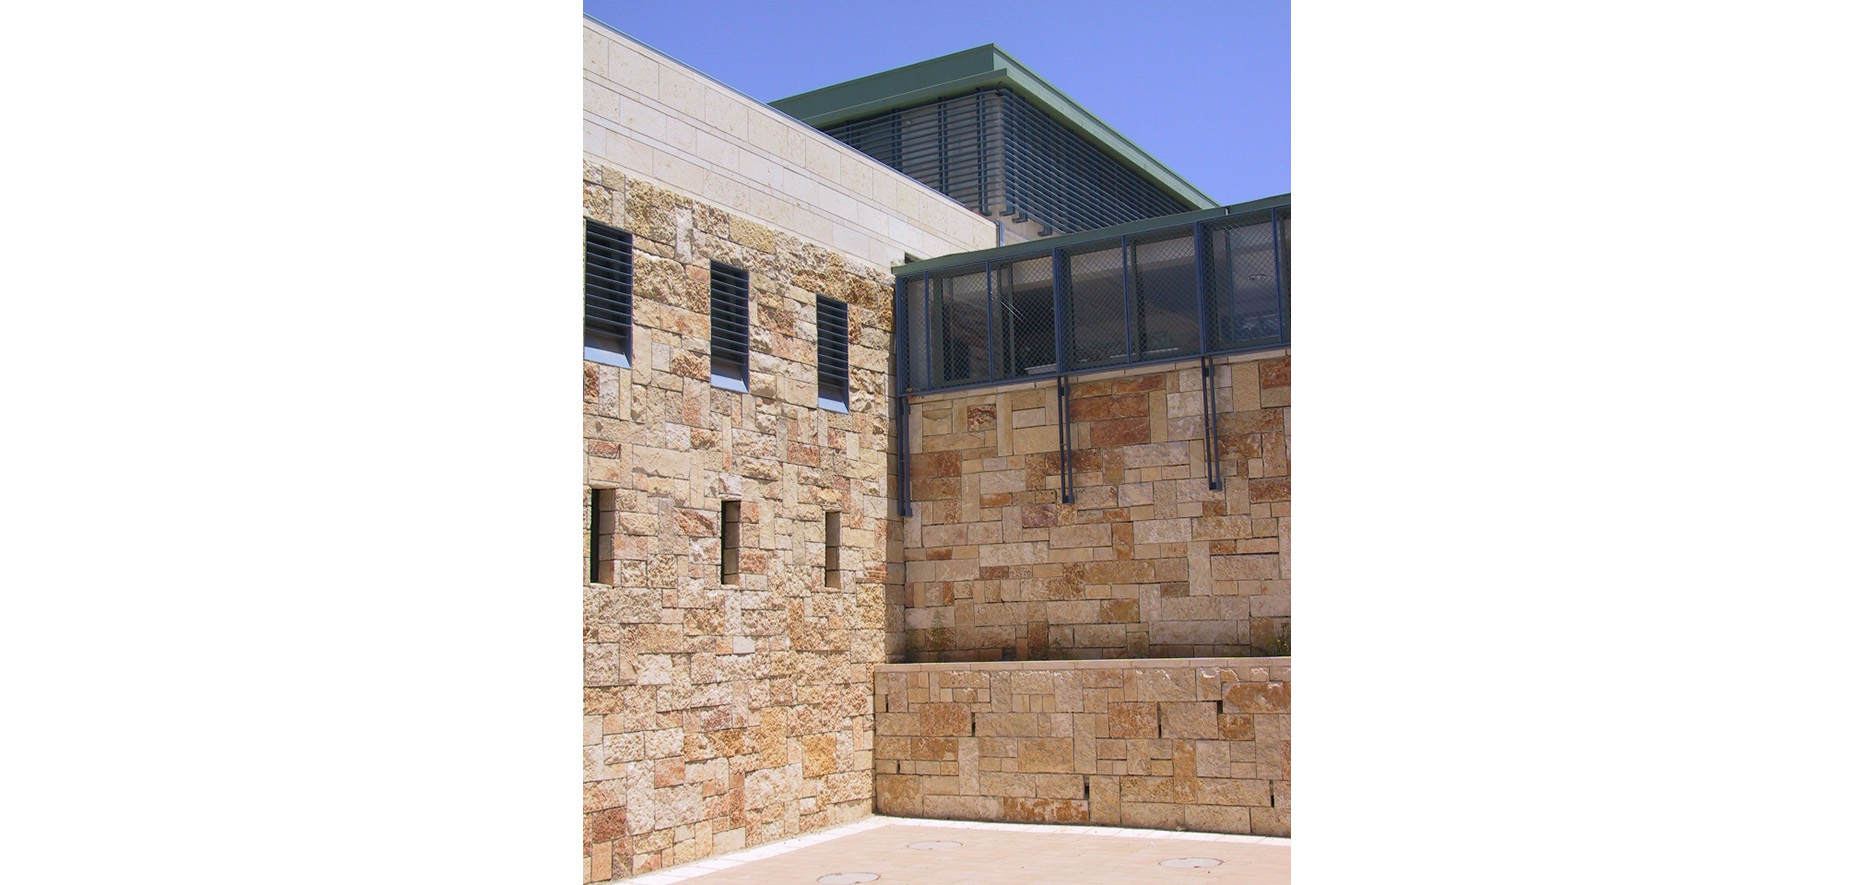 BeitHasefer_HaMakif_Ramot_planned_By_Kolker_Epstein_Architects4